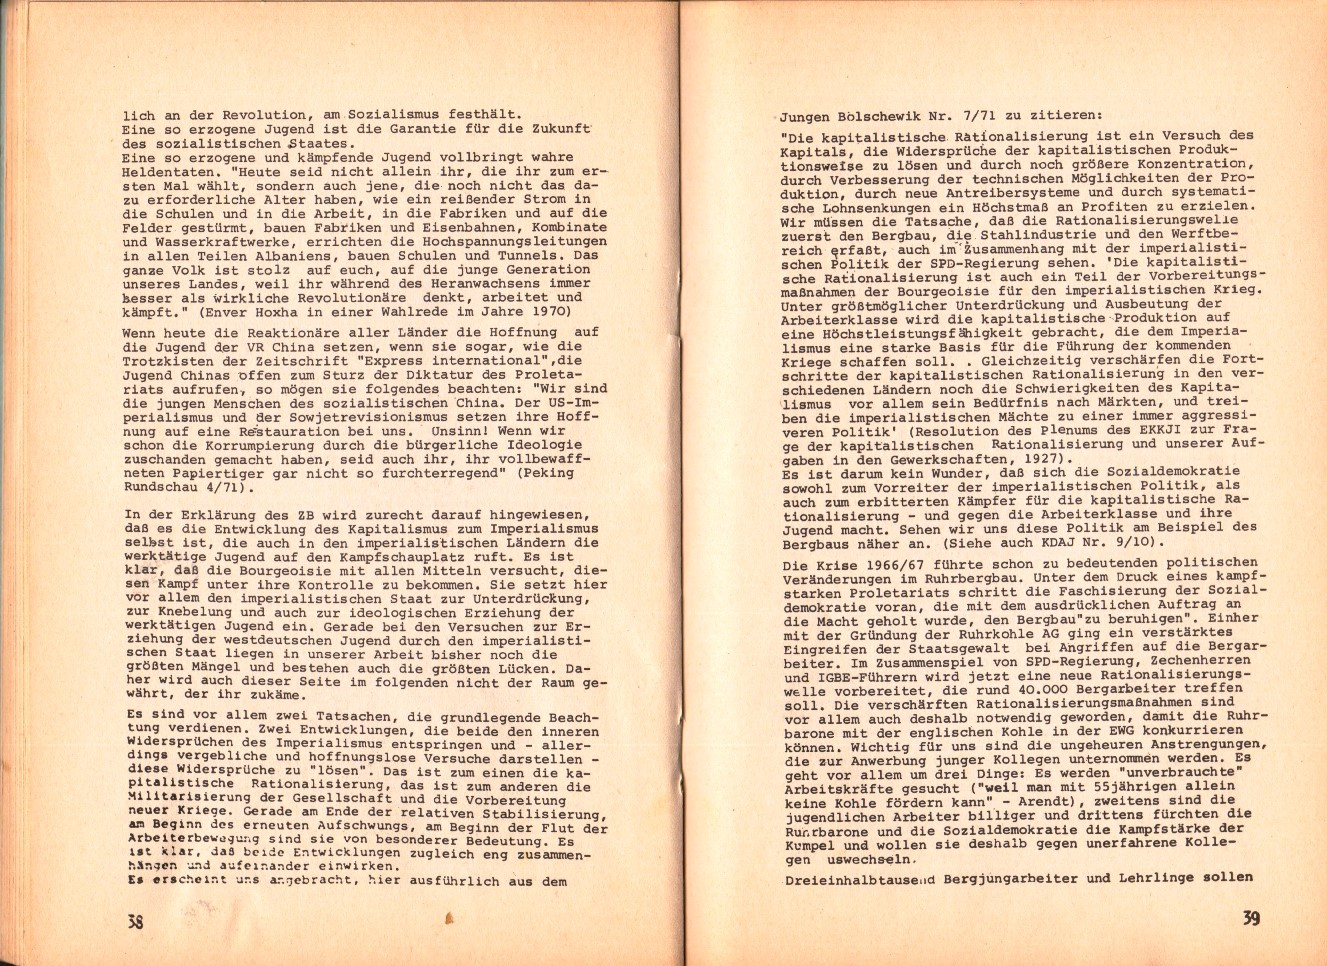 ZB_Parteiarbeiter_1971_10_21